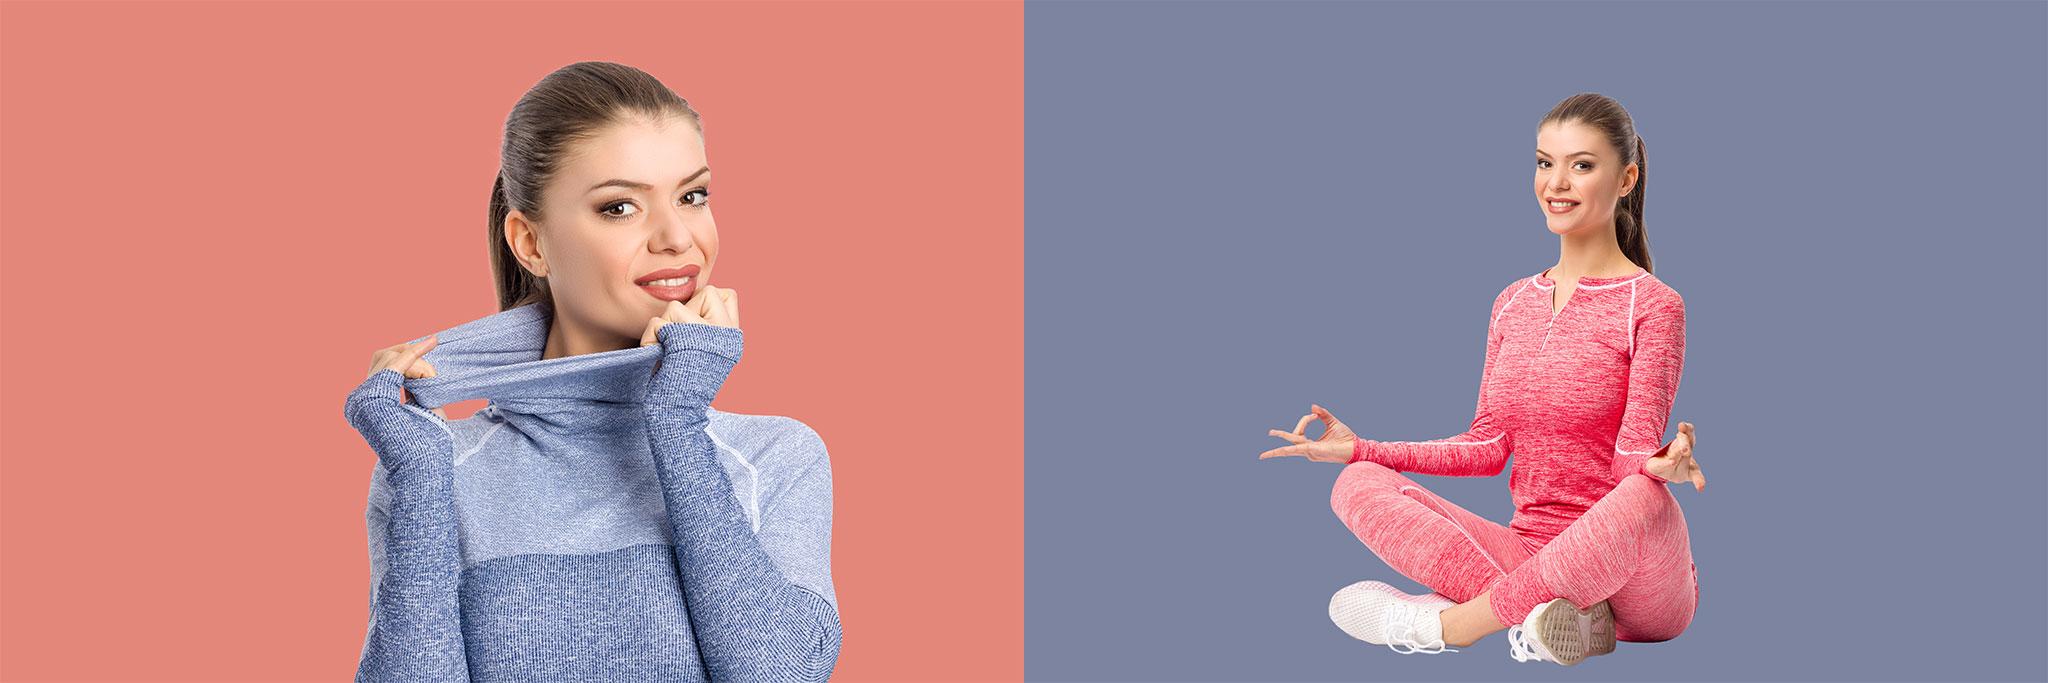 дамско термо бельо - снимка за корица